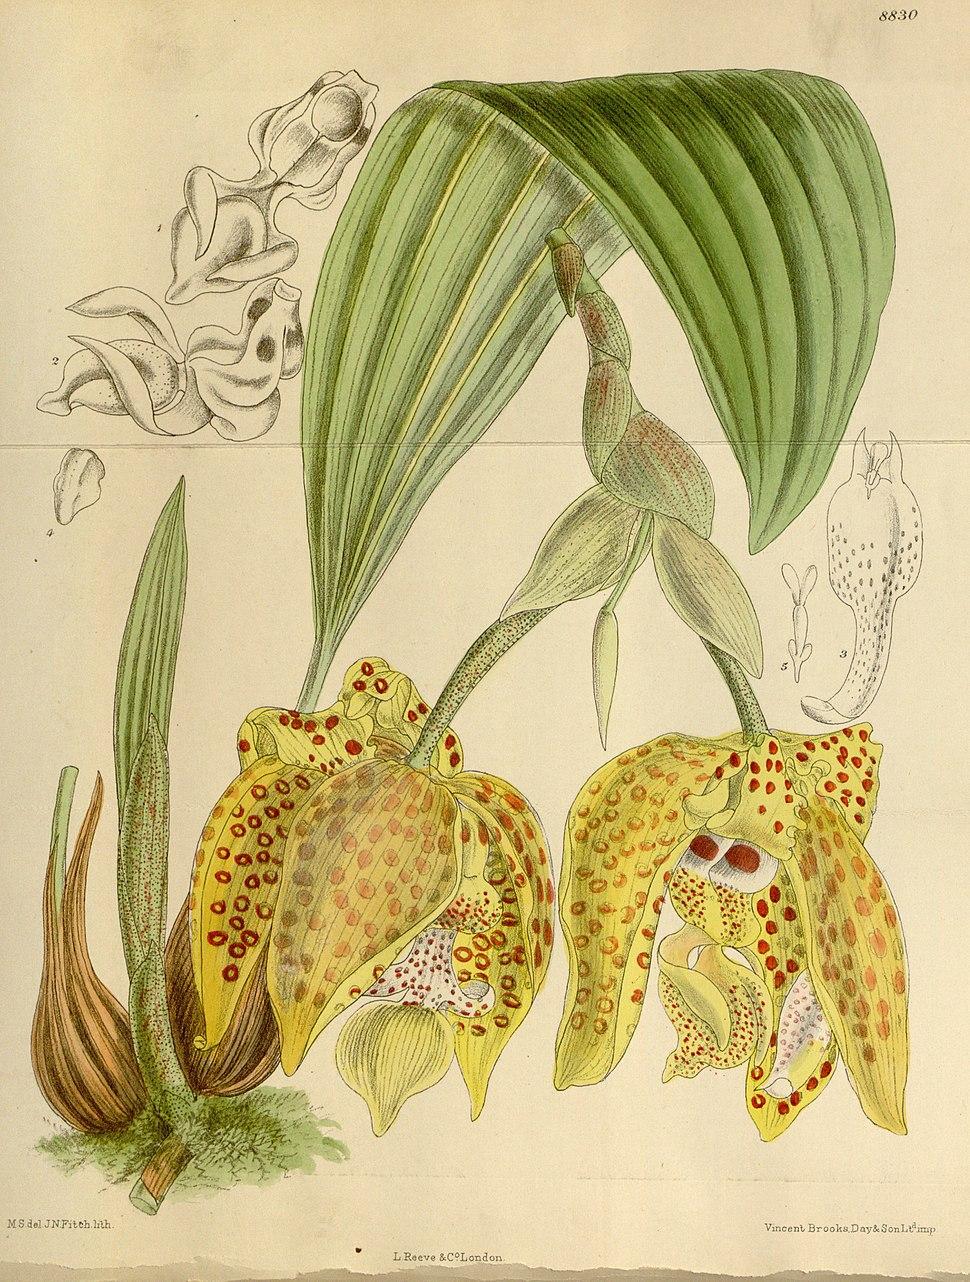 Stanhopea costaricensis - Curtis 146 (ser, 4 no. 16) pl. 8830 (1920)